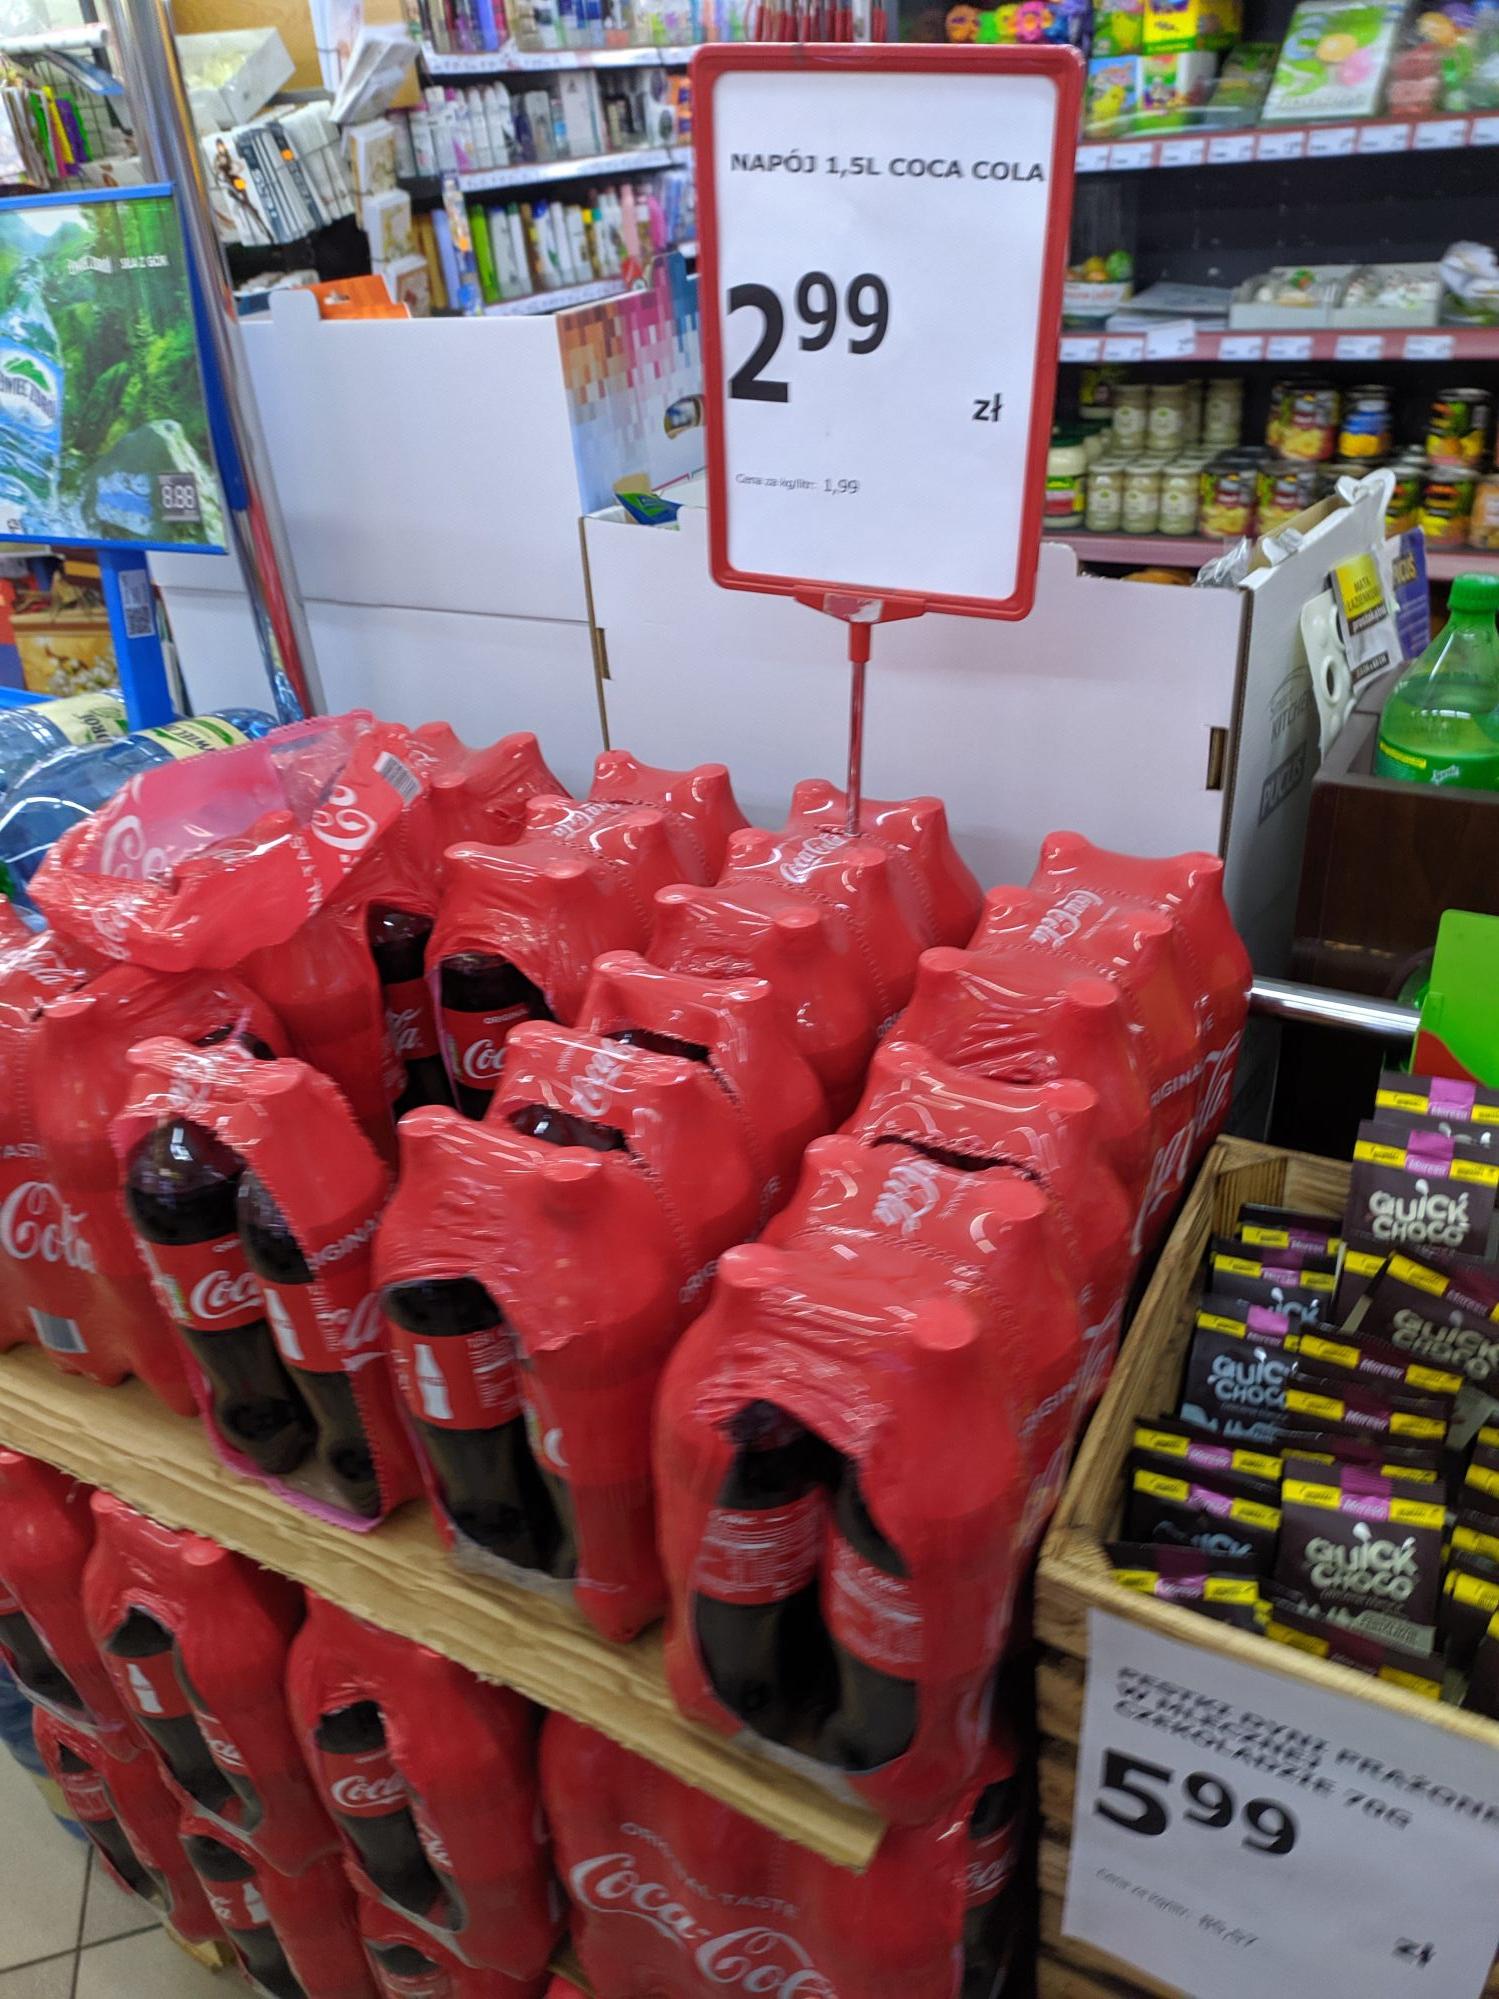 Coca-cola 1.5 L za 2.99 w spar